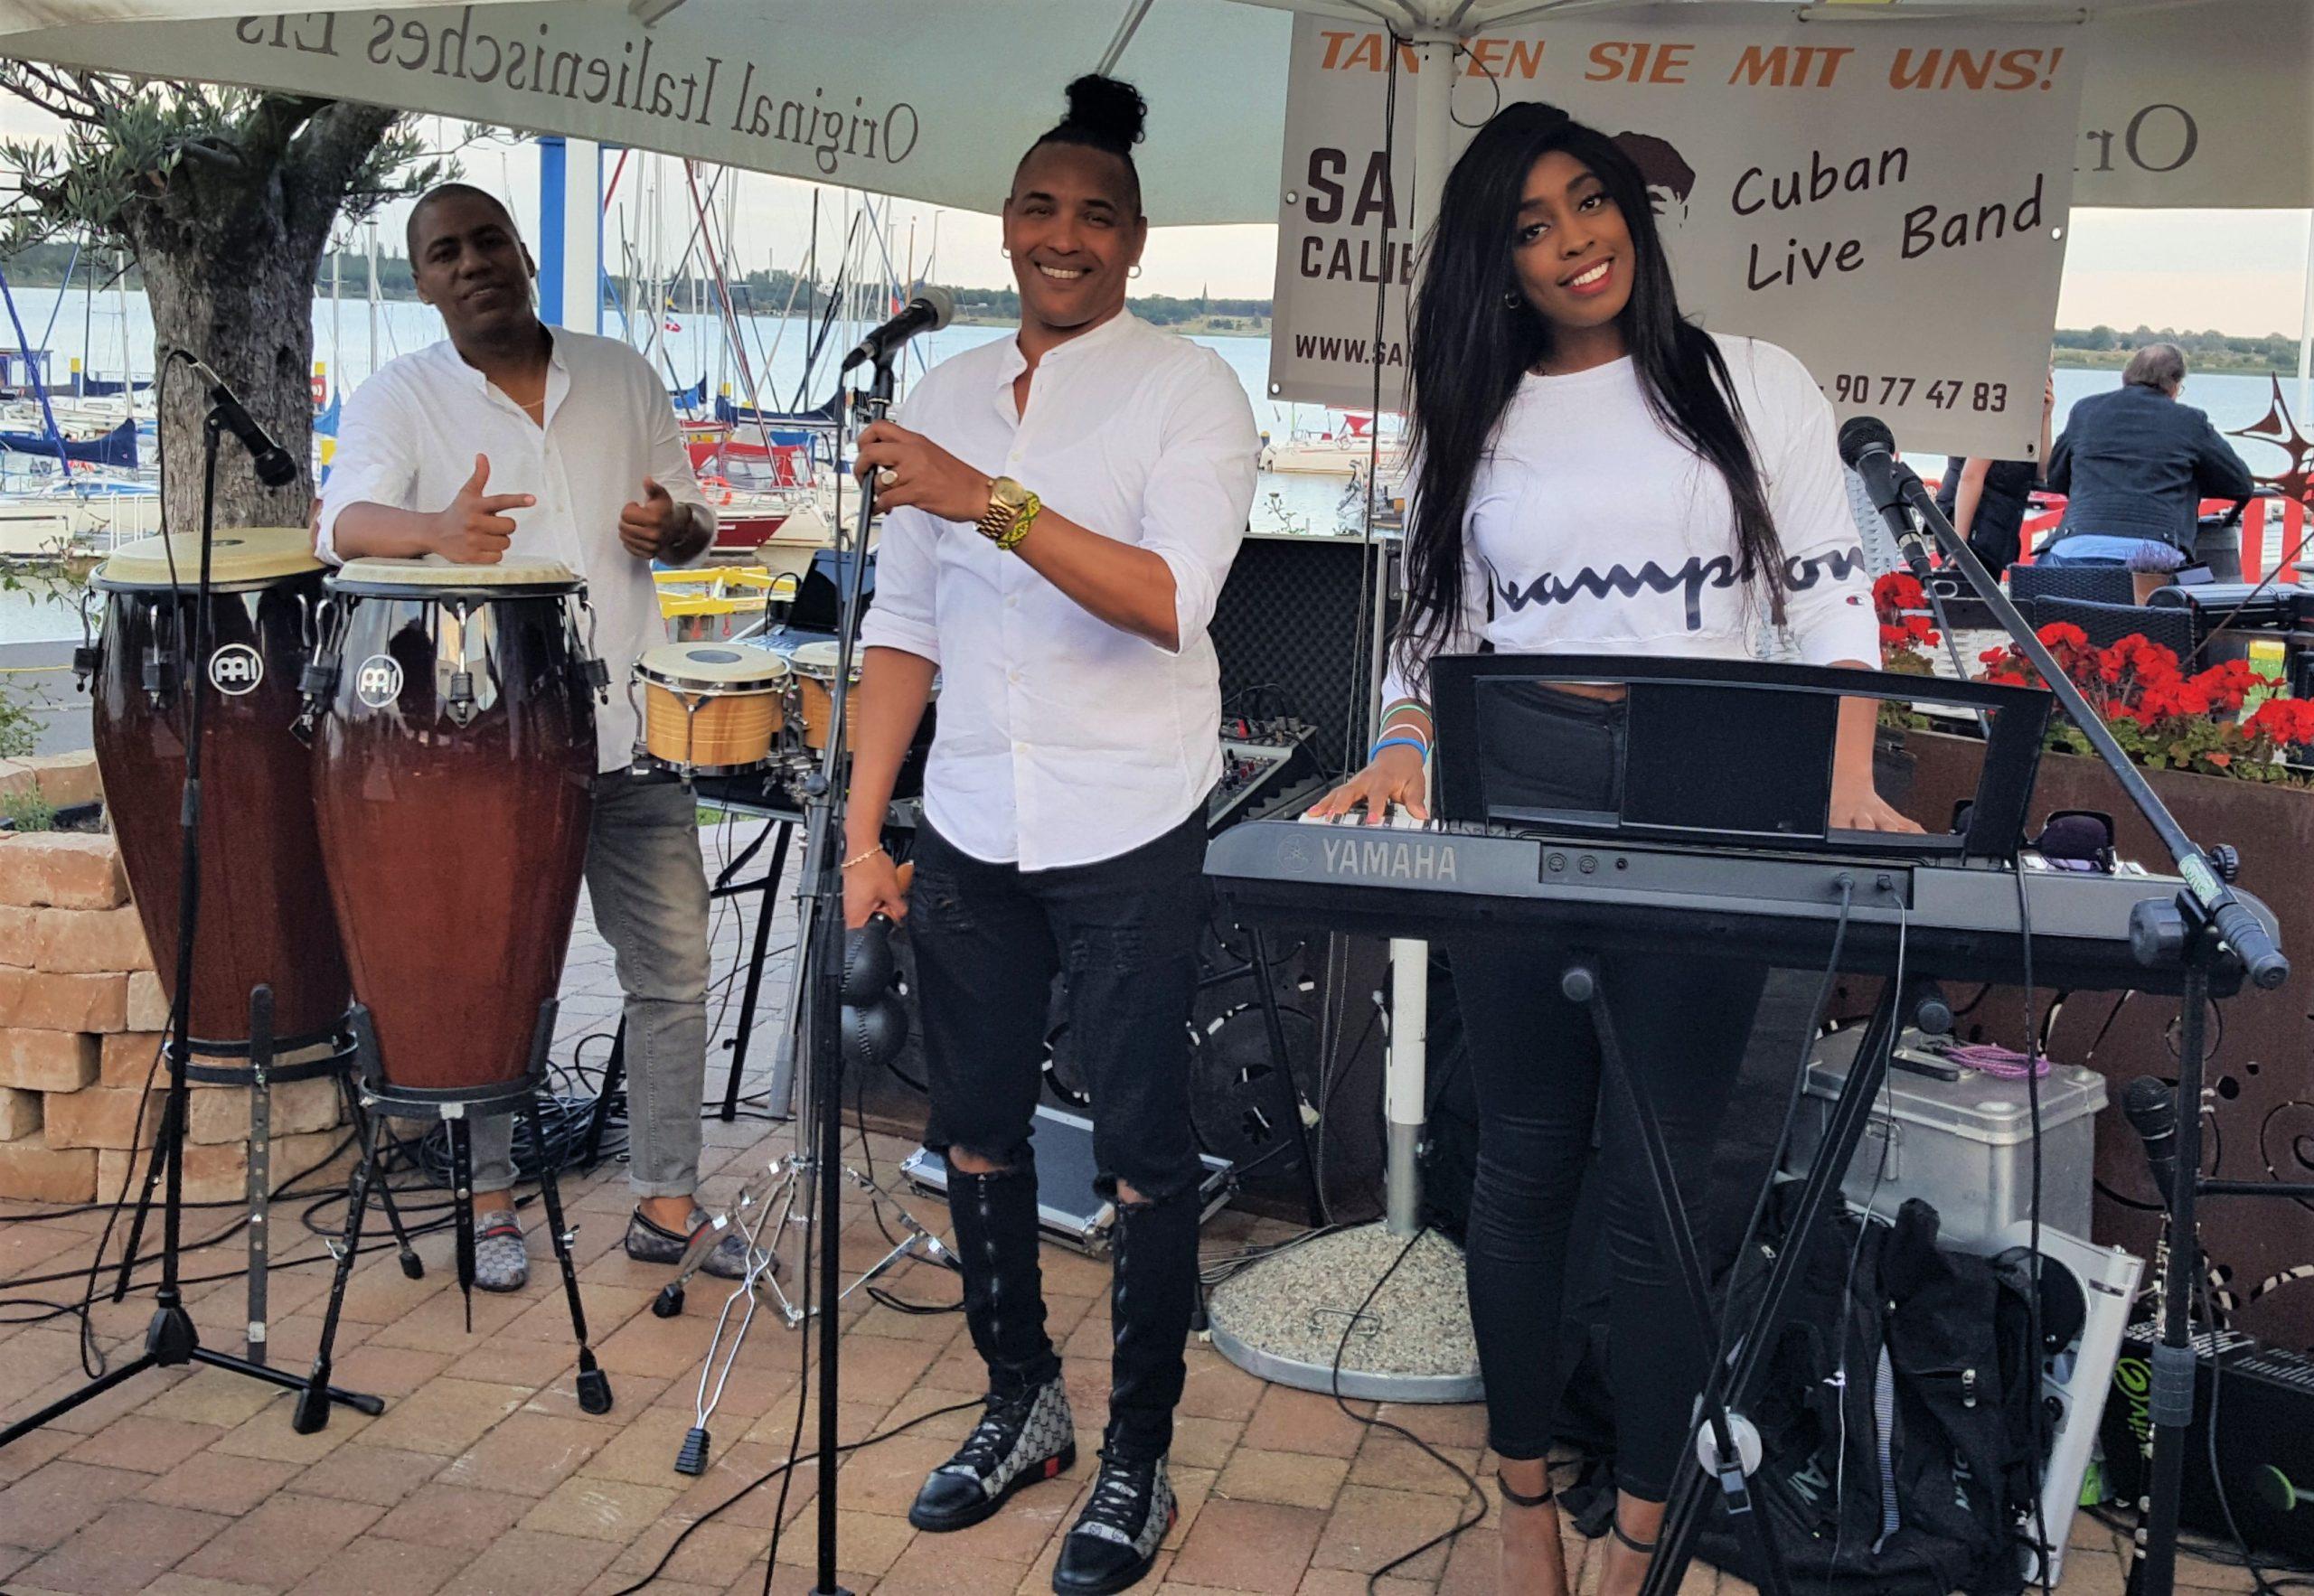 Salsa Caliente LE Live Band Buchen Sommerparty 2020